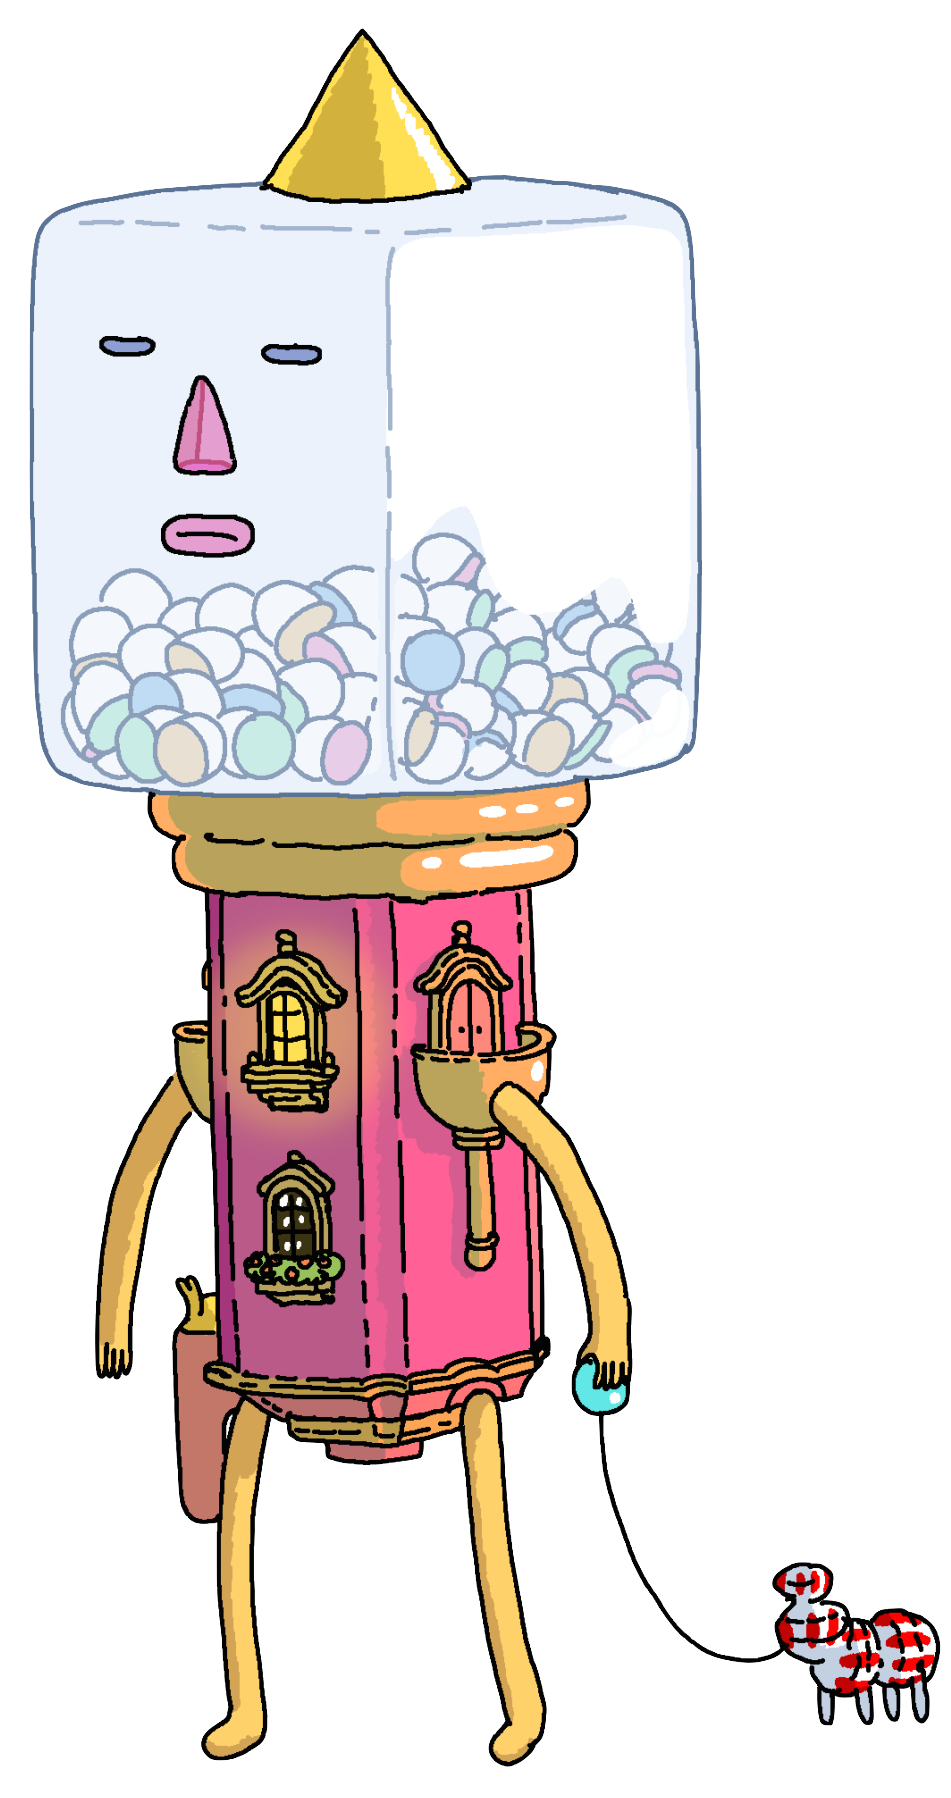 Prize ball guardian adventure. Gum clipart candy machine